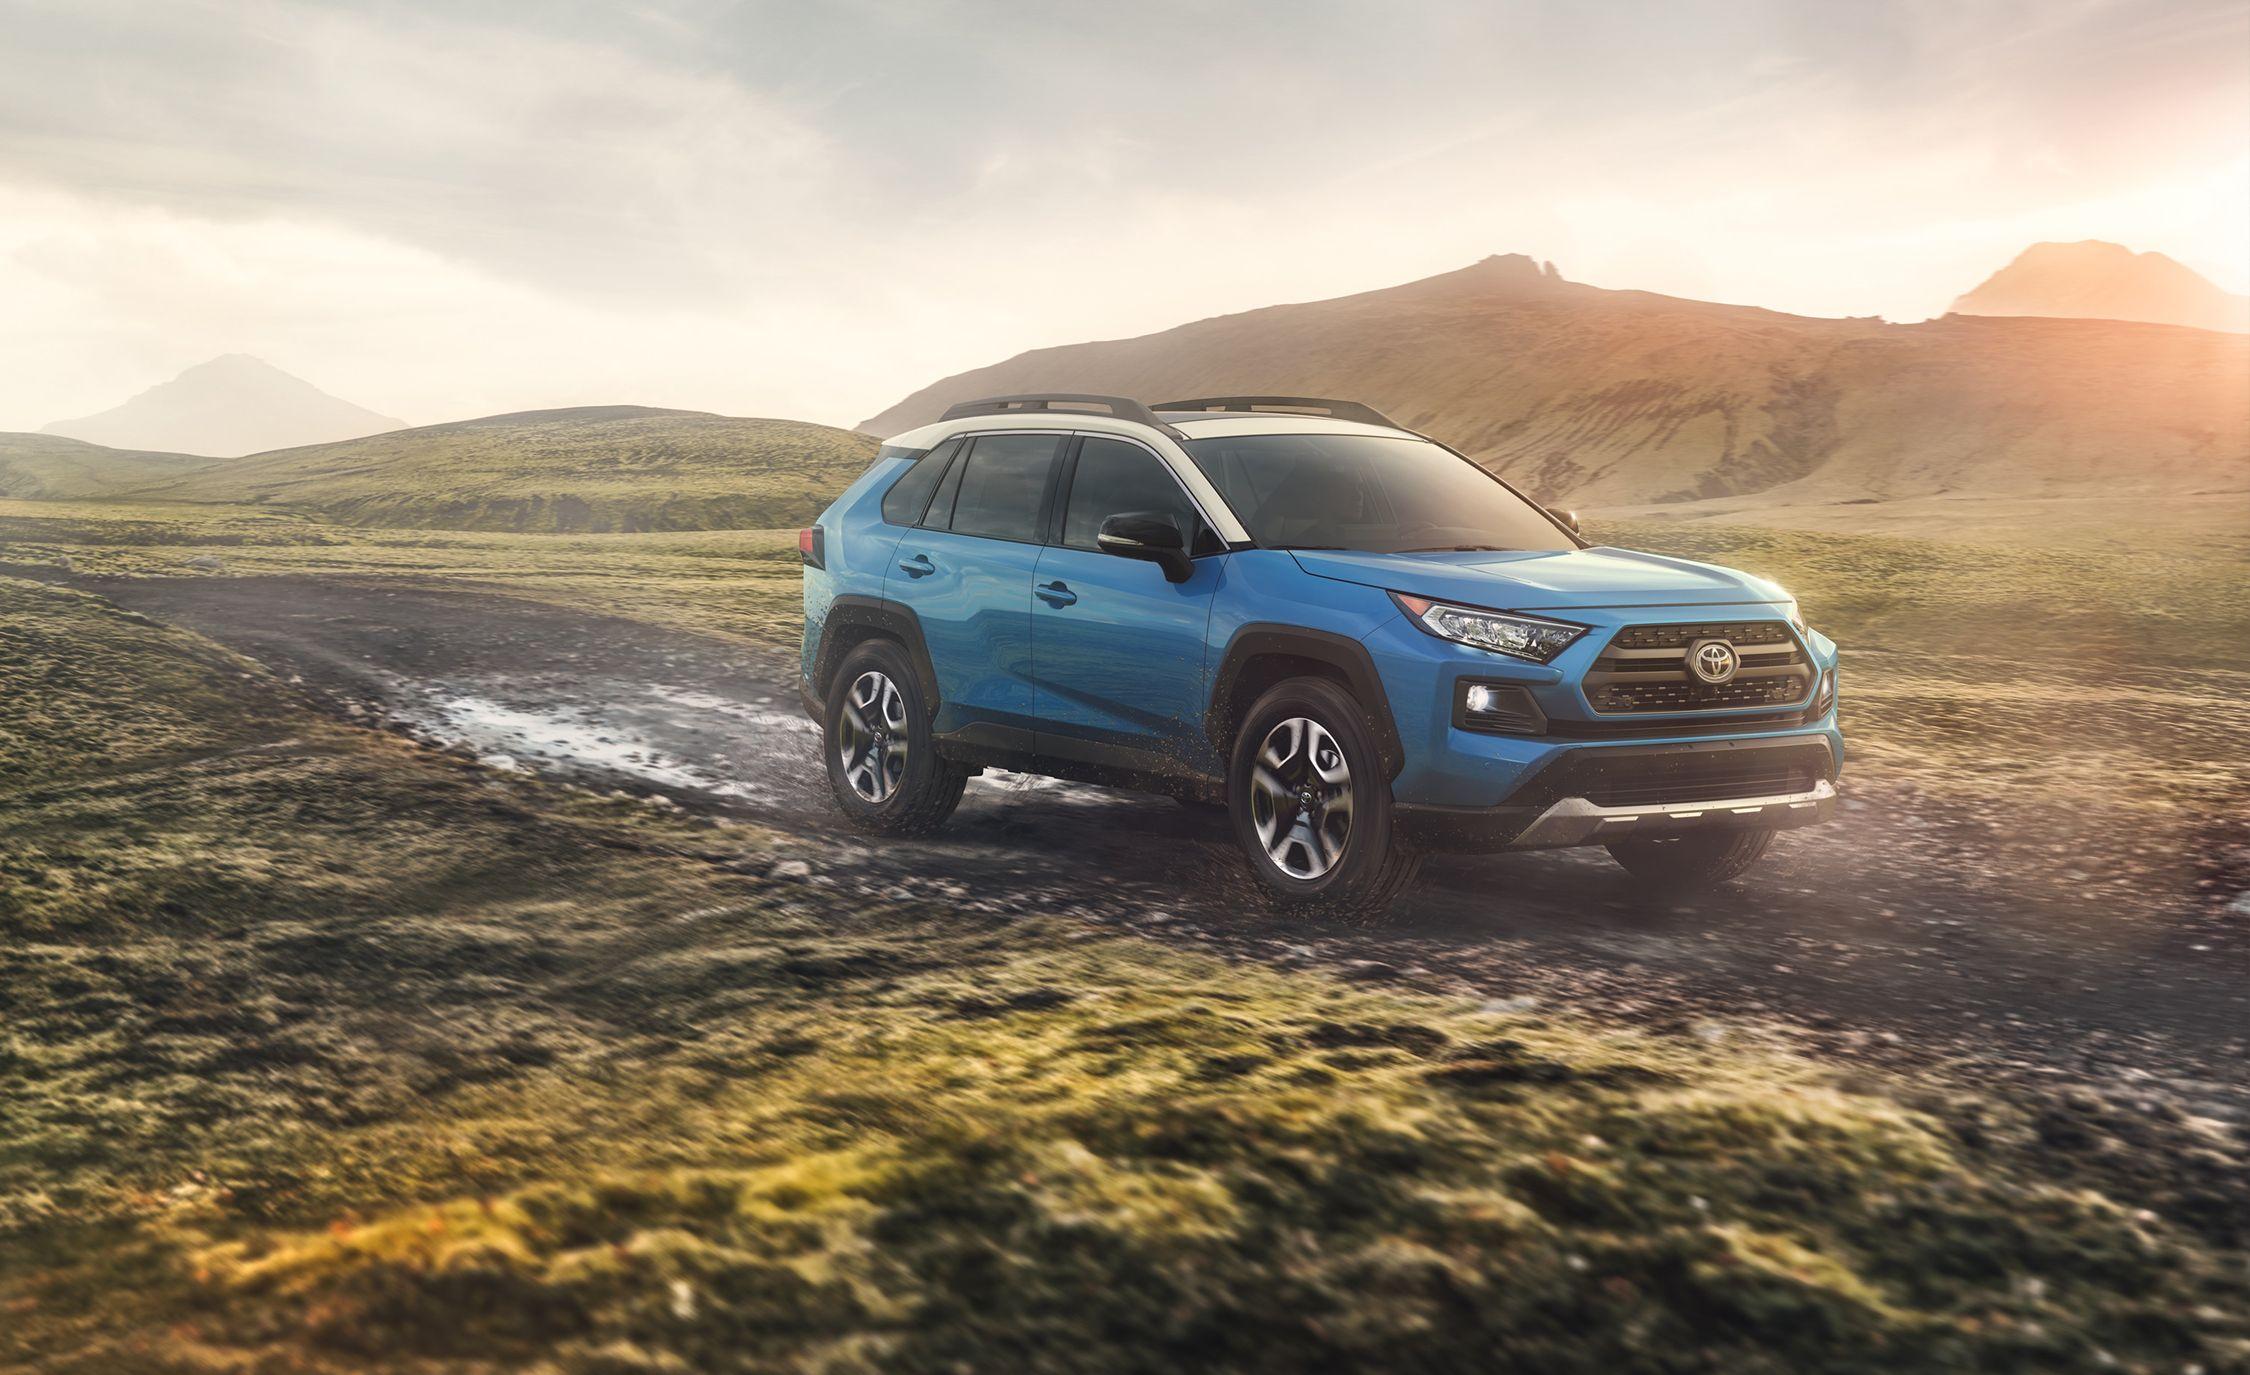 Amazing 2019 Toyota RAV4 / RAV4 Hybrid: Sales Champ Gets A Compelling Overhaul